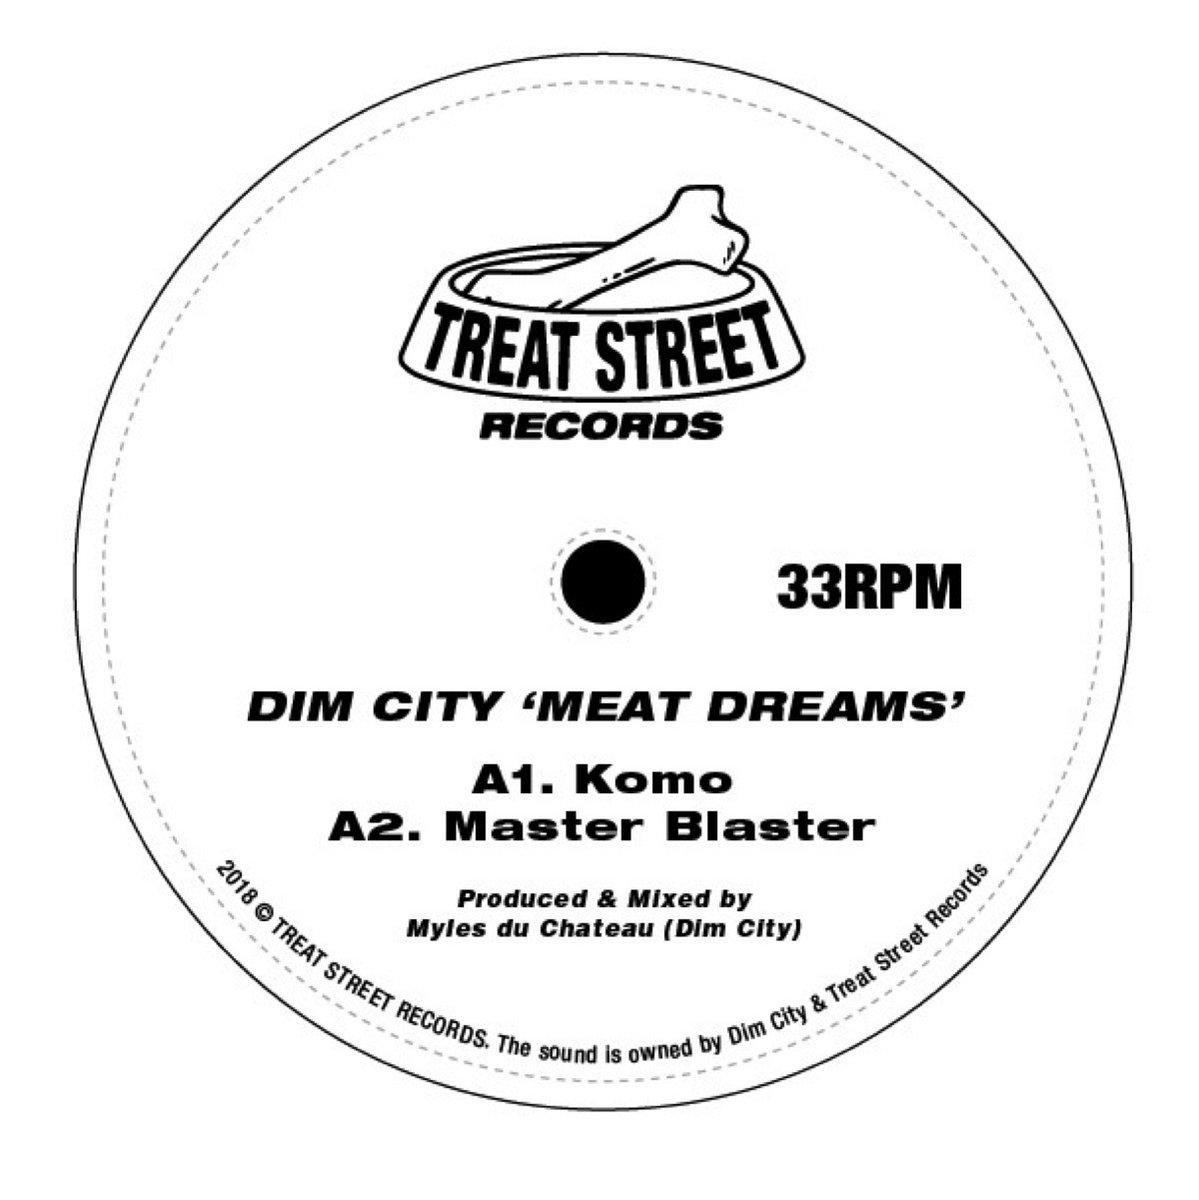 Treat street records